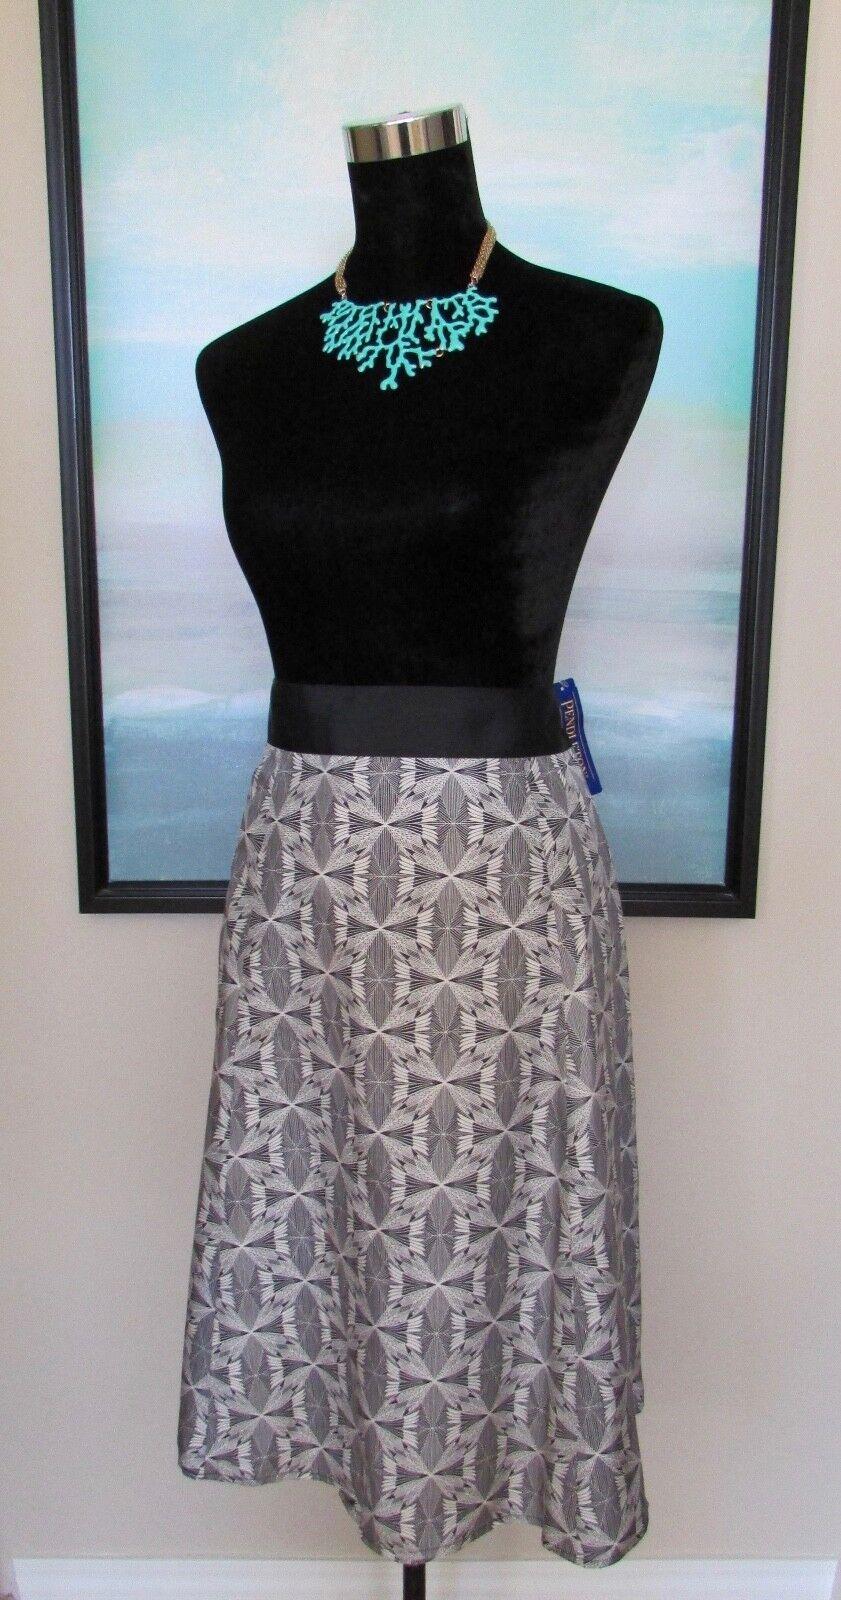 149 NWT PENDLETON Silk Skirt B&W Native American Pottery Print Sz 18